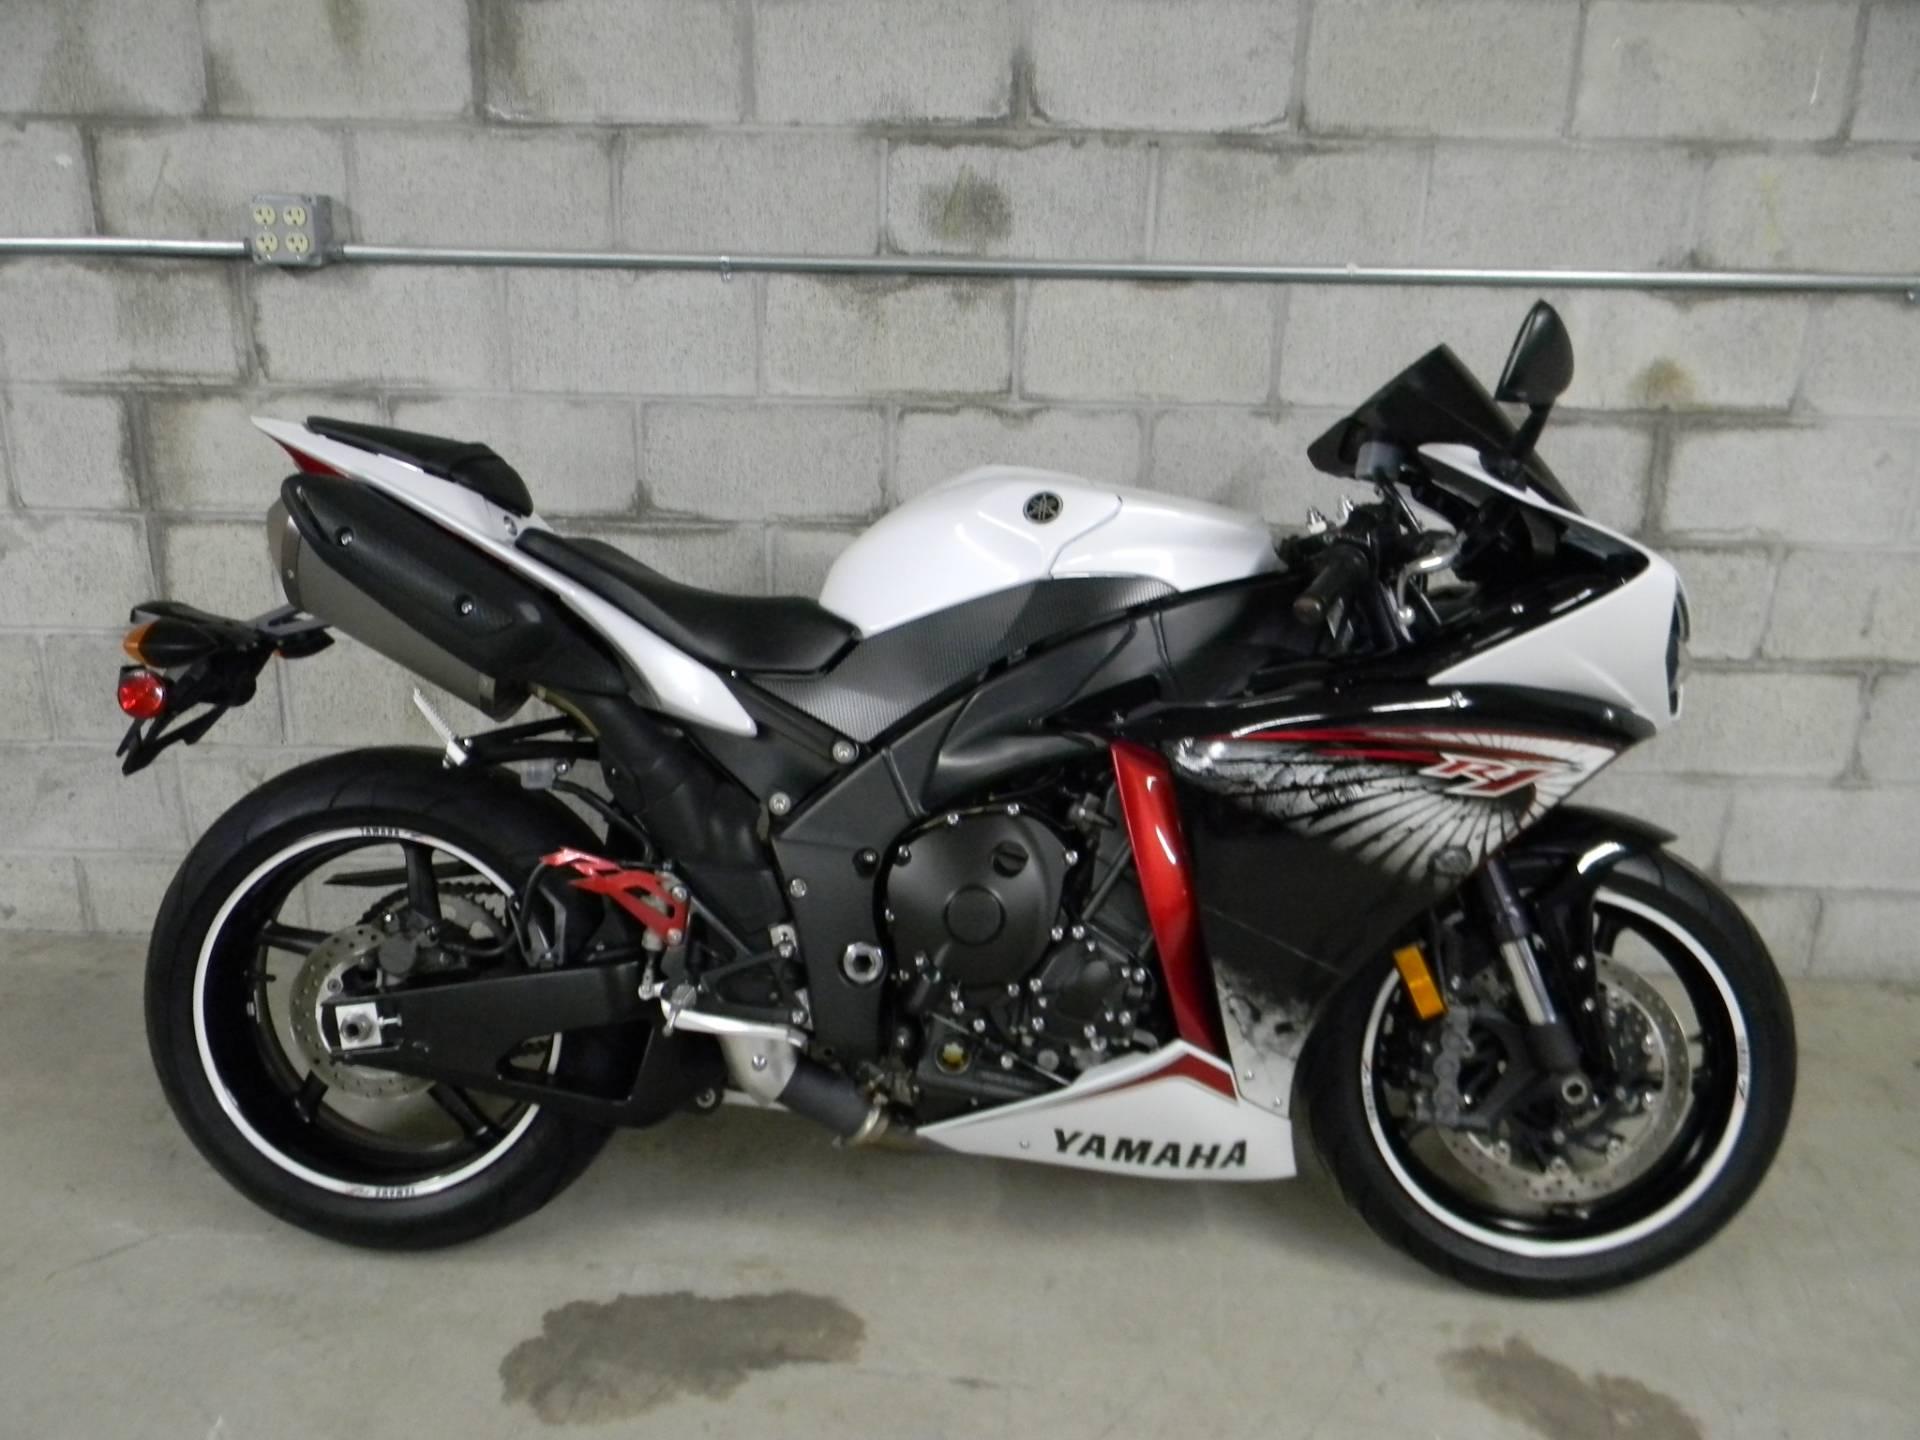 2012 Yamaha YZF-R1 for sale 112044